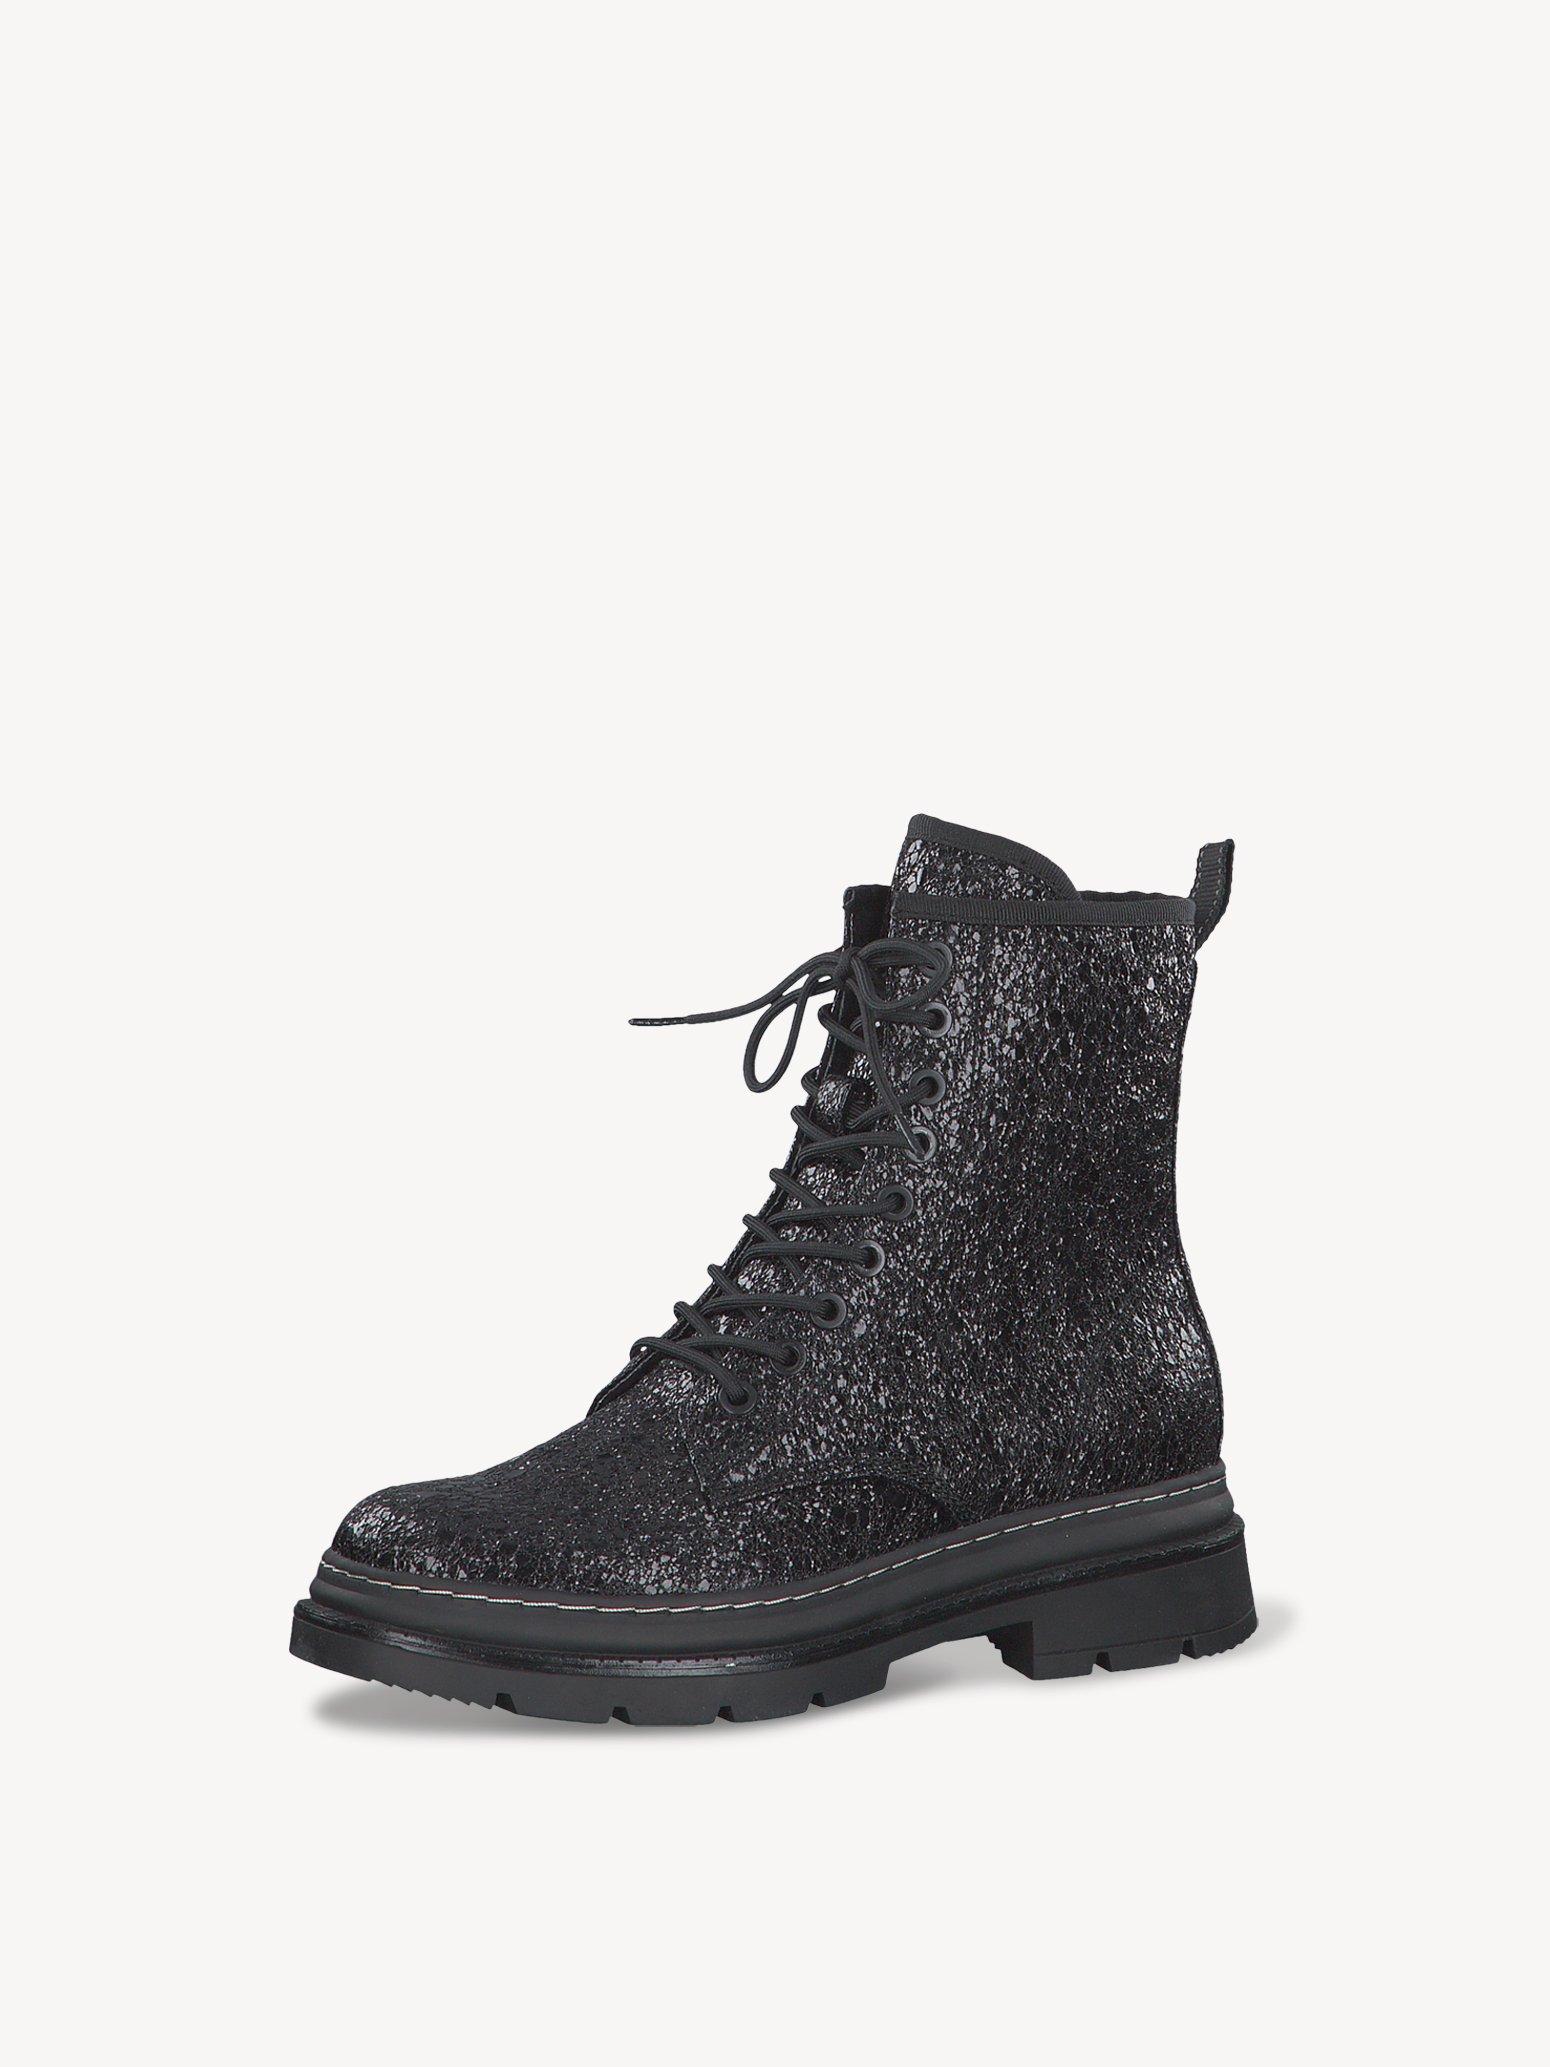 Ботинки Tamaris 1-1-25864-35-034